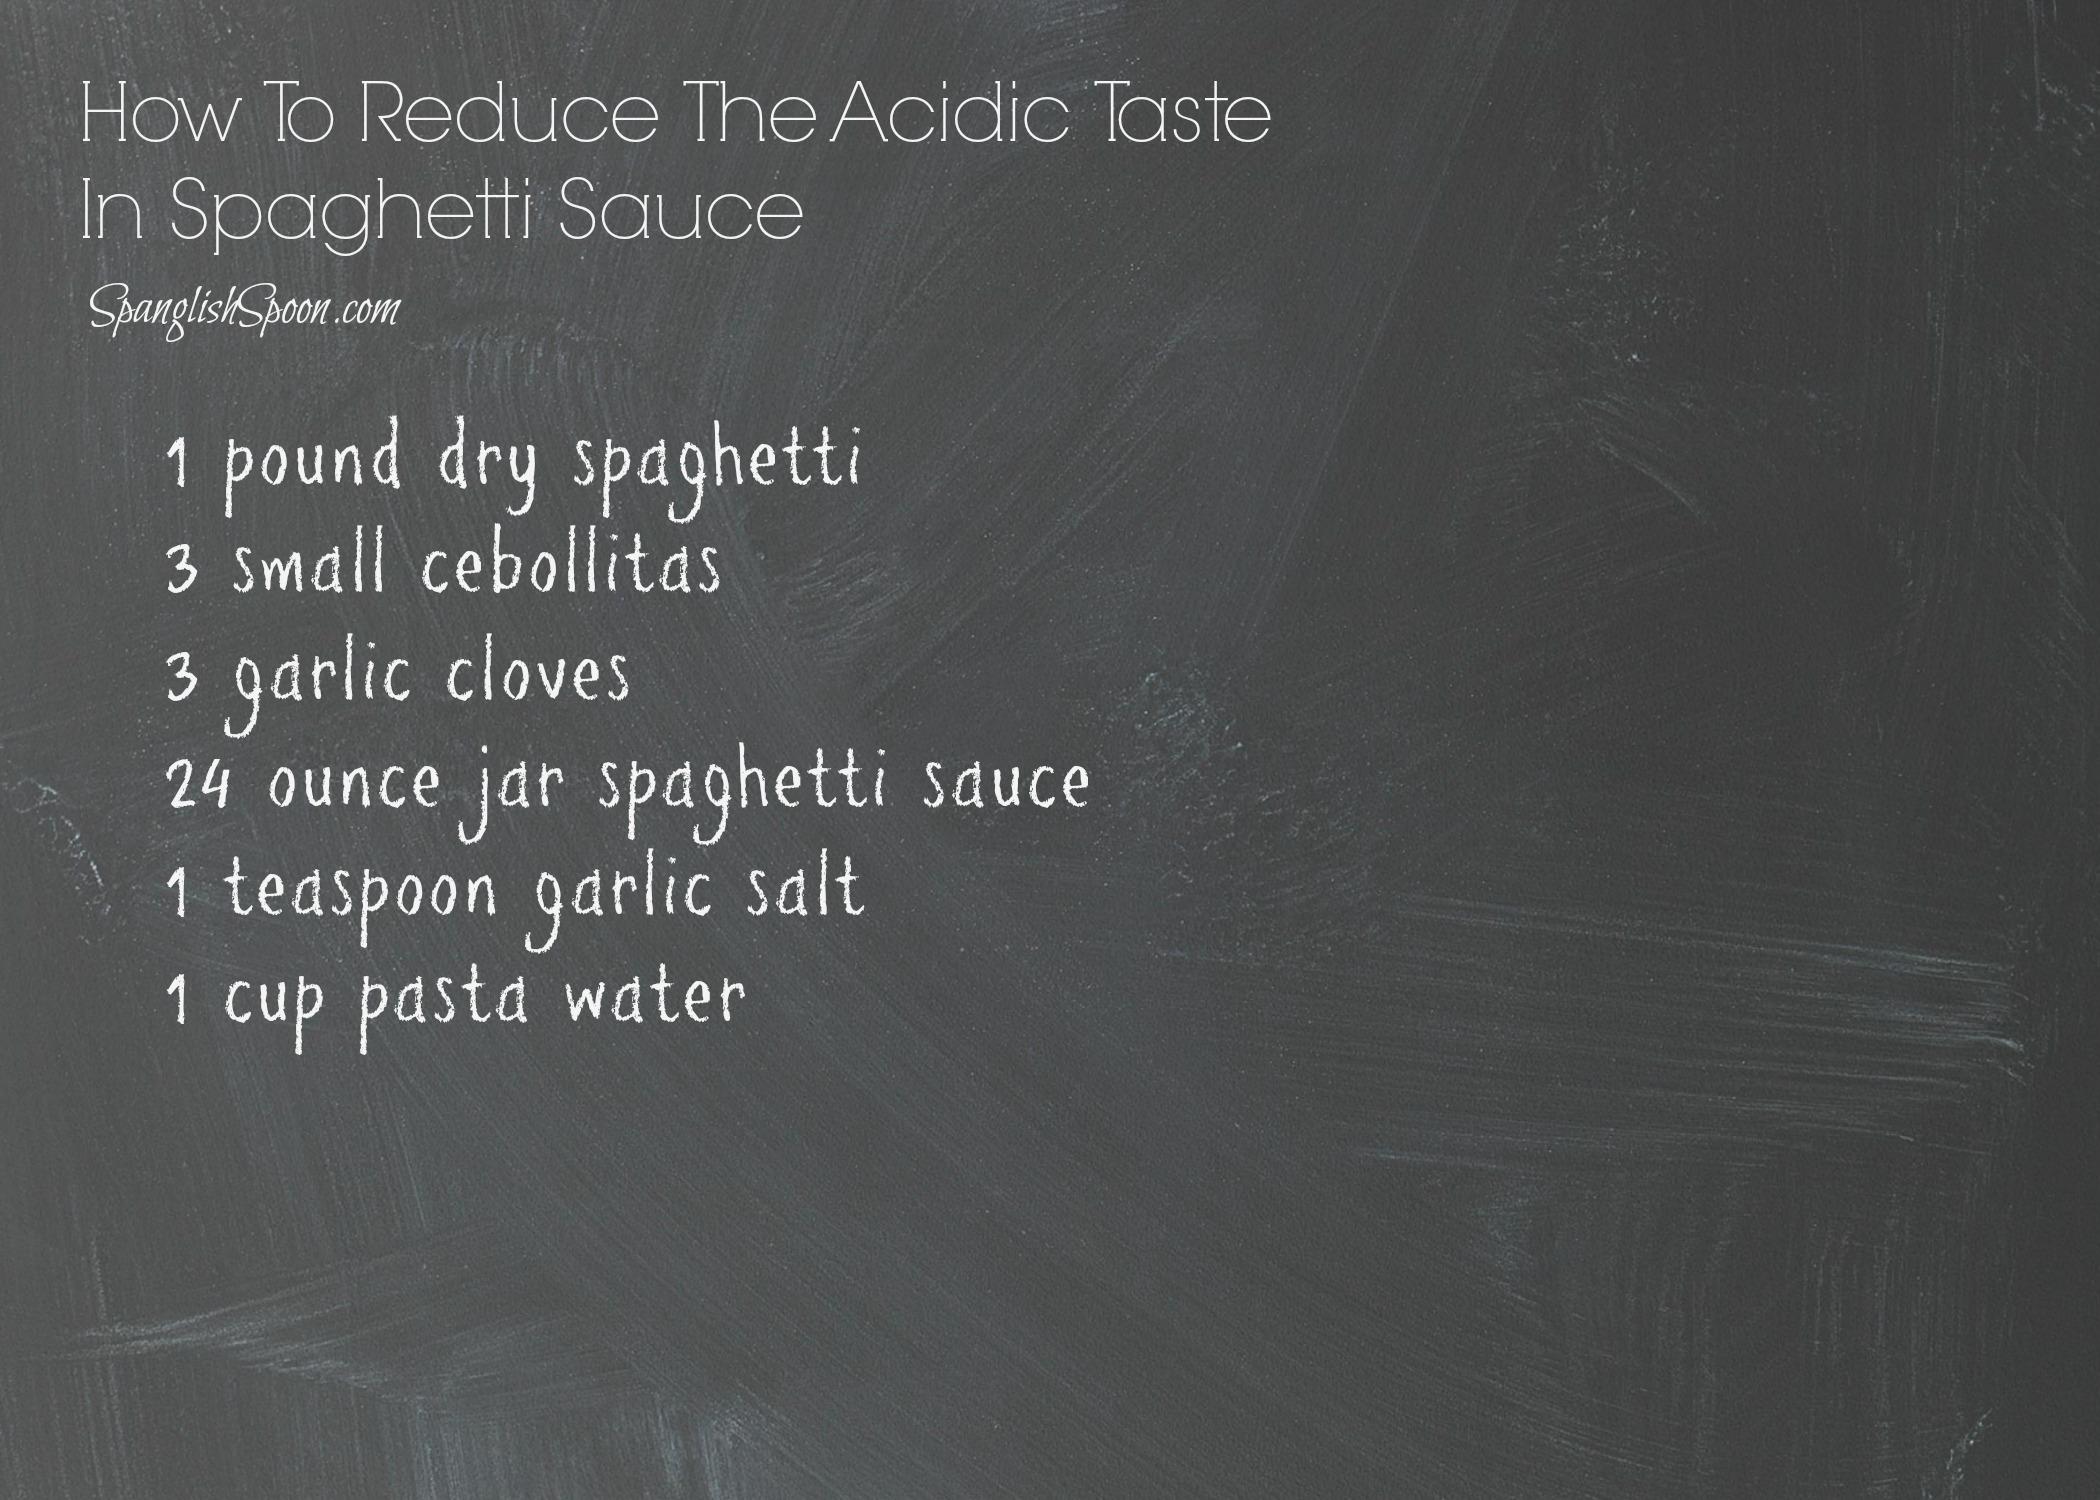 How to reduce the acidic taste in spaghetti sauce 2